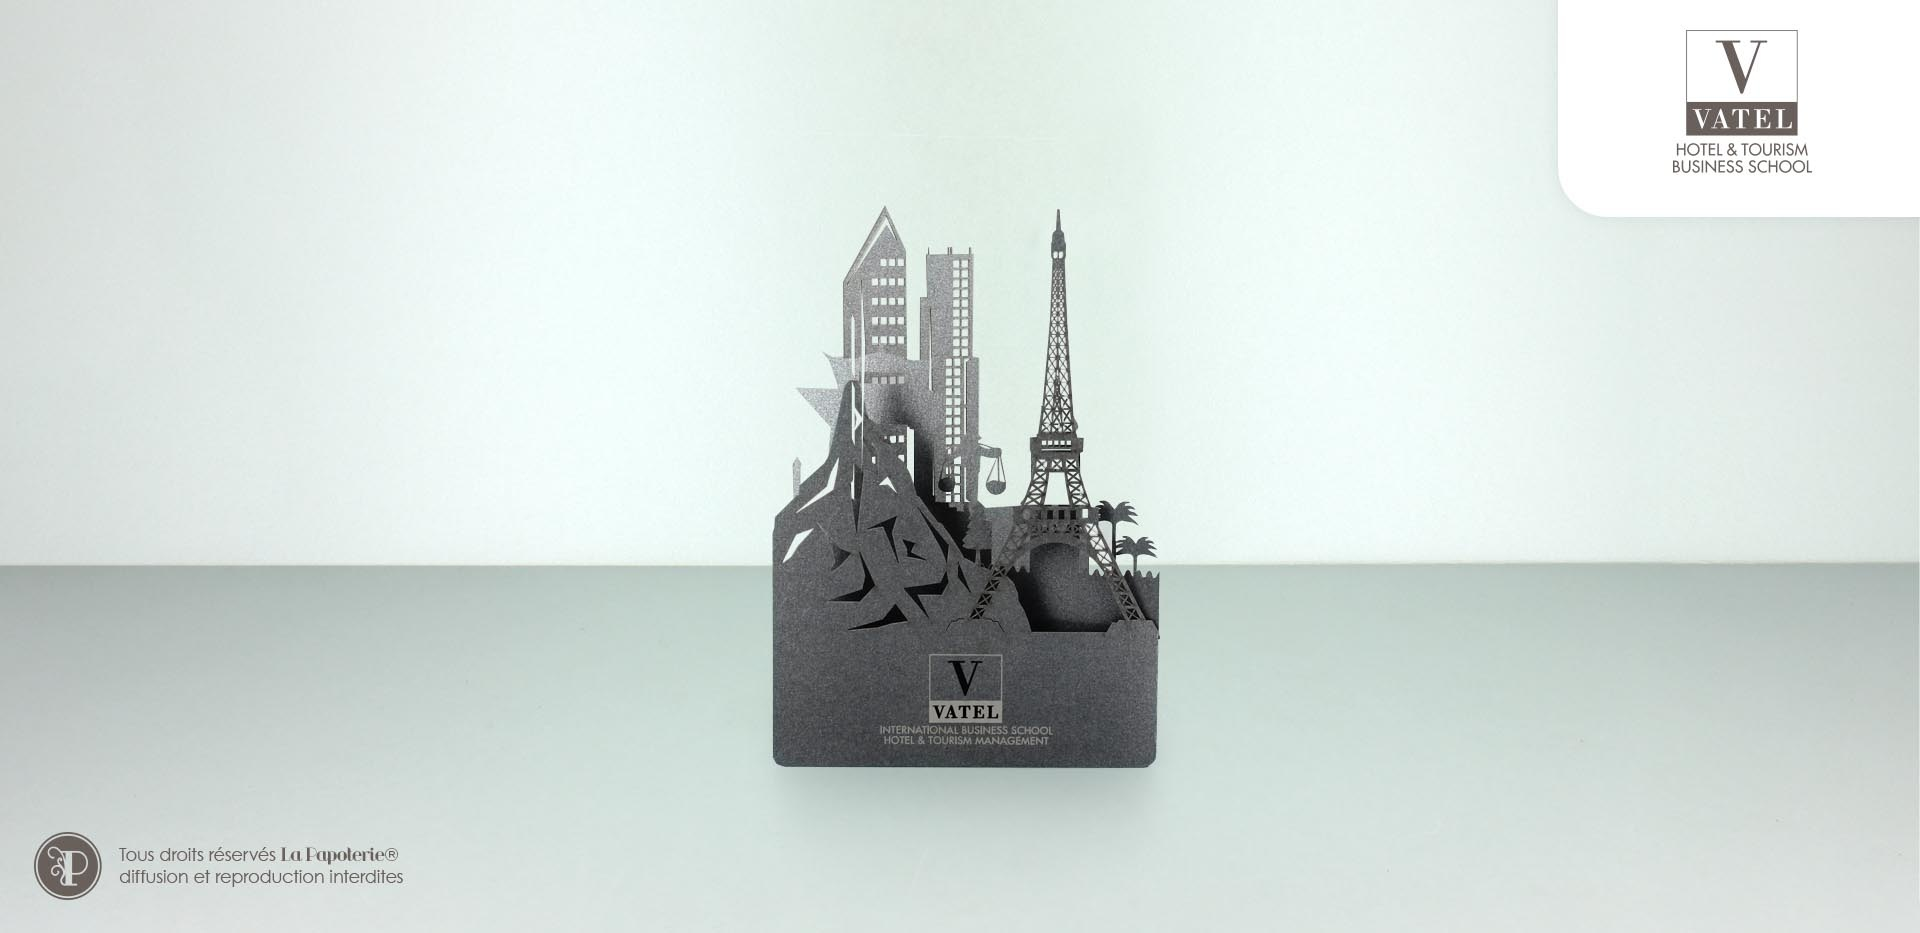 La Papoterie vatel-voeux-2017 Skyline greeting card Vatel